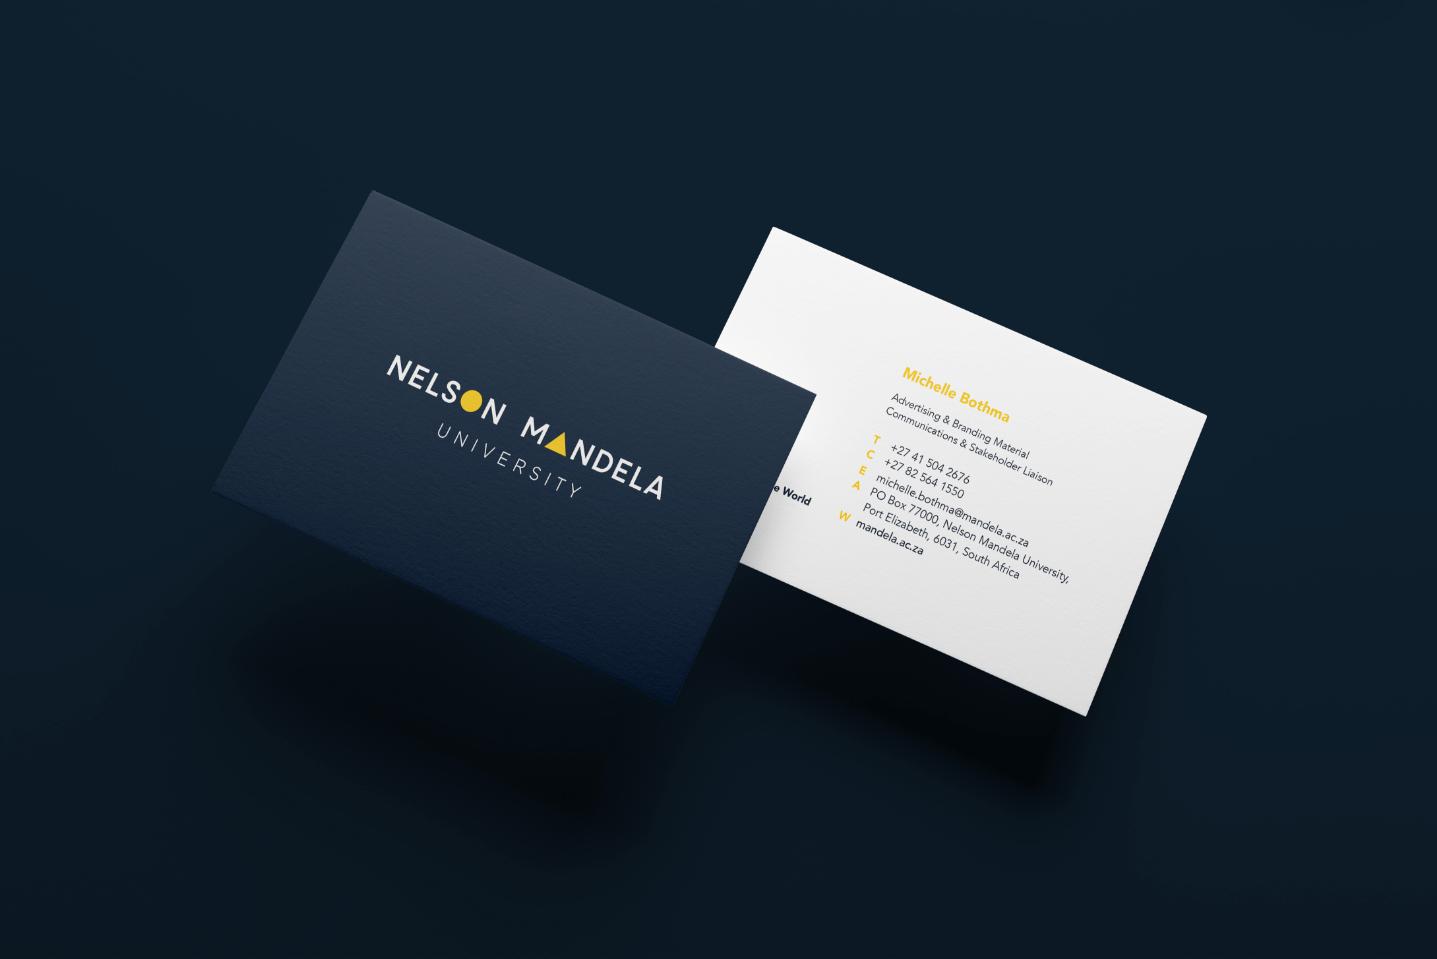 Creative Caterpillar client Nelson Mandela University business cards.